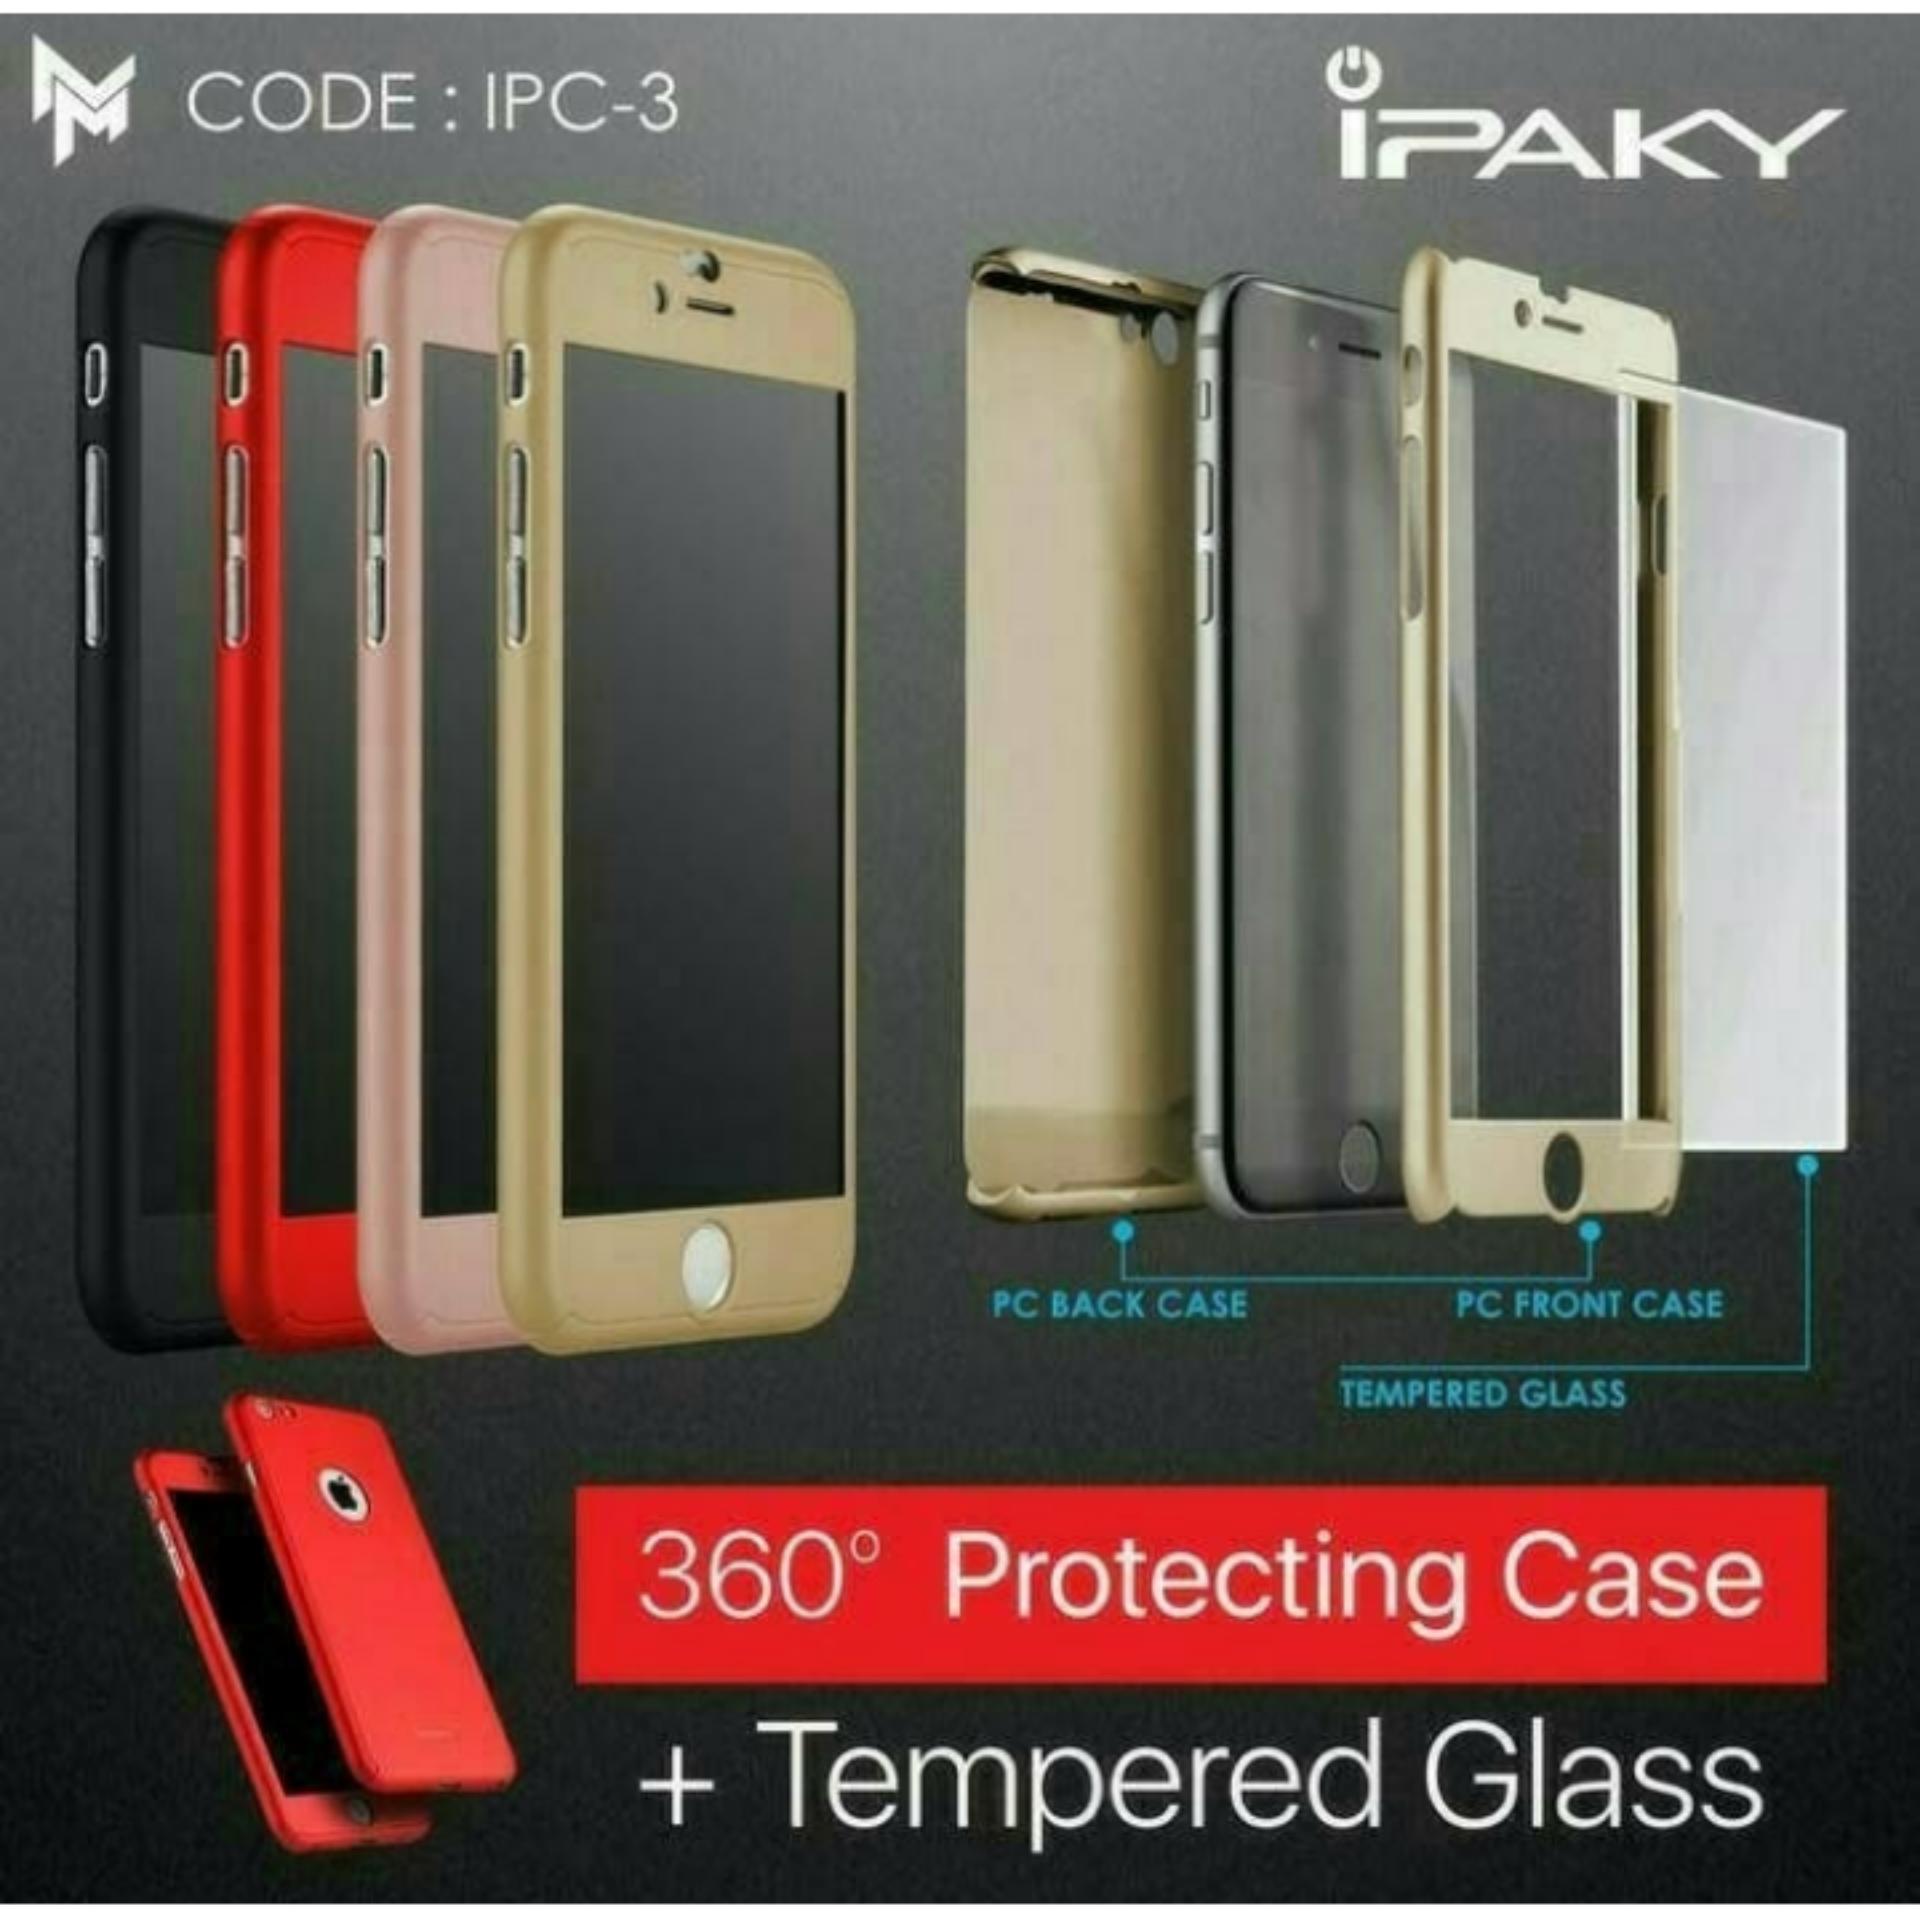 Kehebatan Case Ipaky 360 For Motorola Moto E4 Full Body Protection Tempered Glass Plus Cover Warna Casing Free